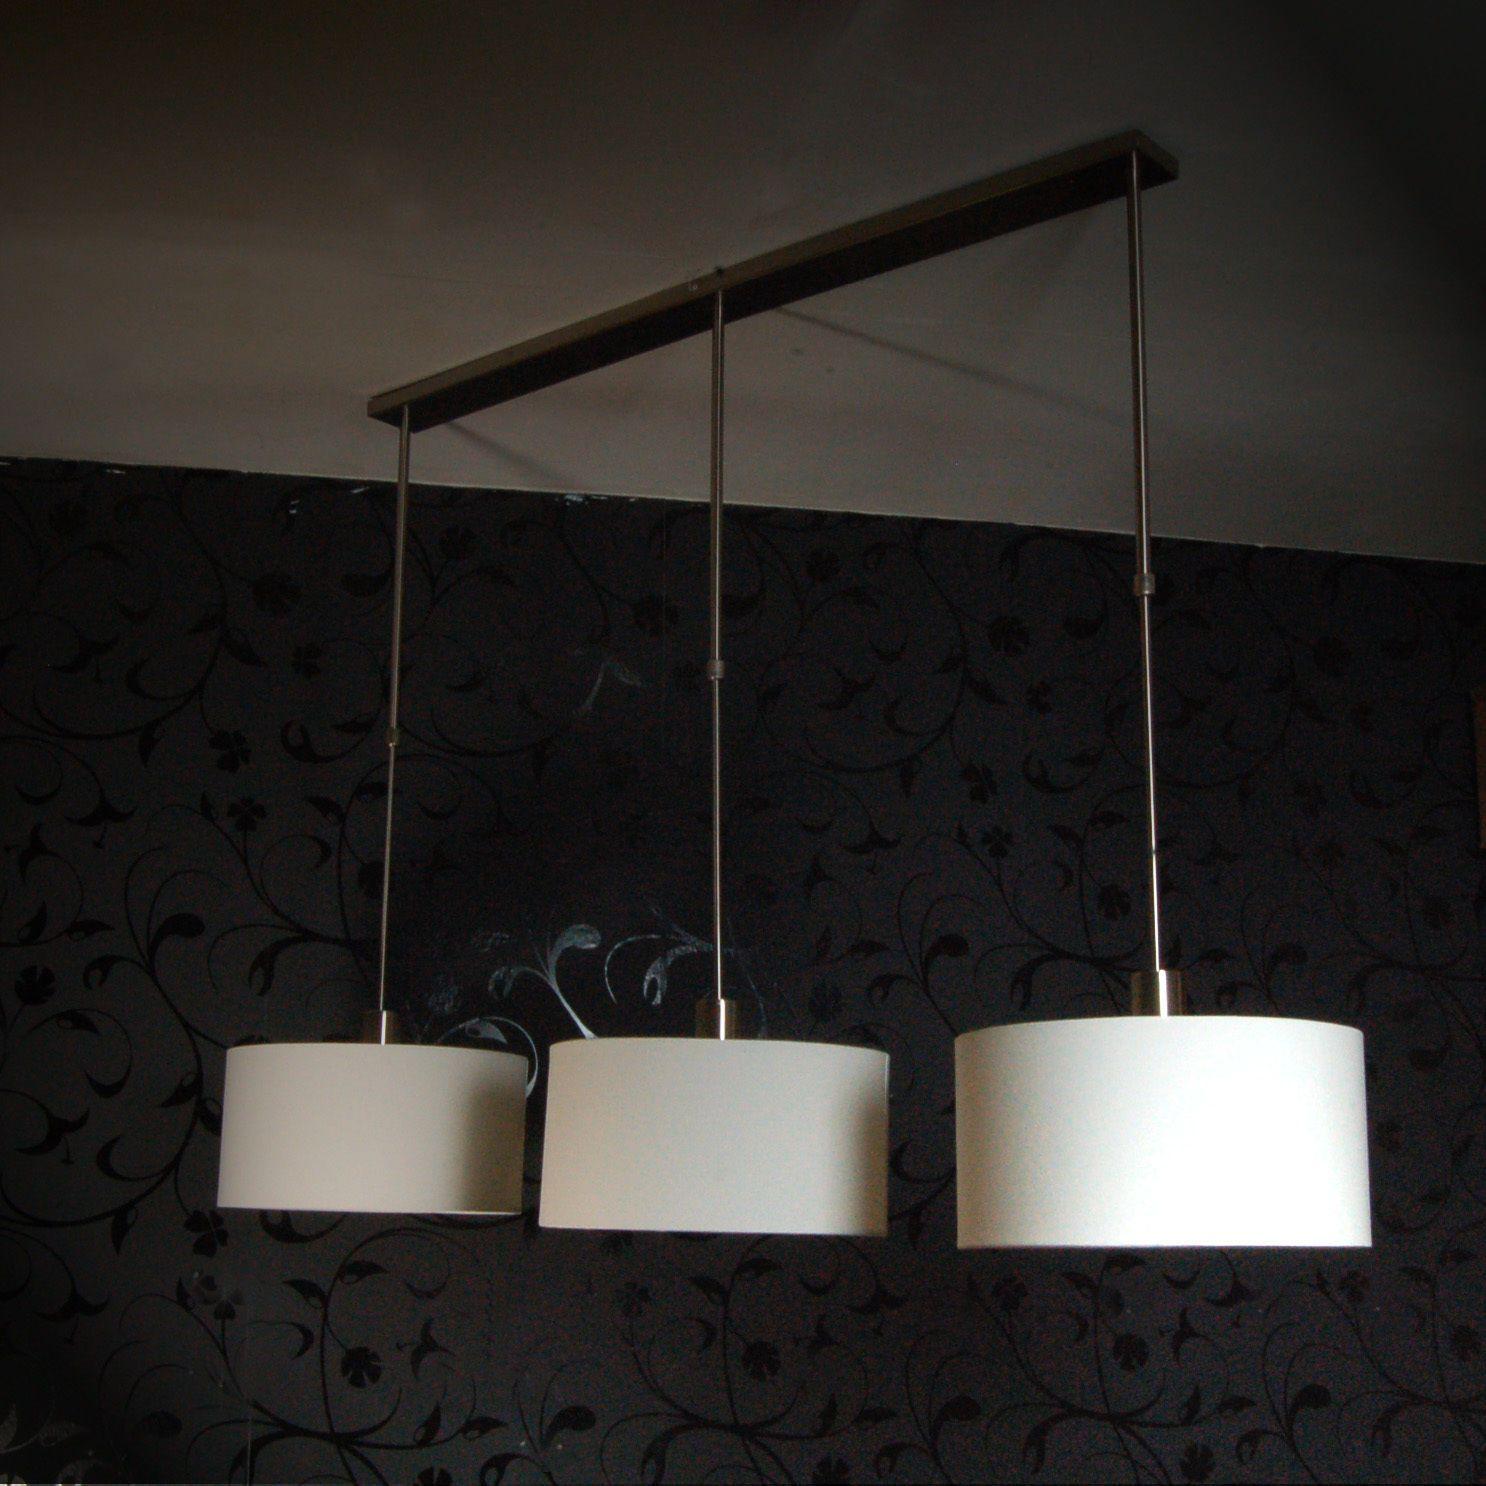 h ngelampe toskana ii esstisch leuchte 3 schirme creme. Black Bedroom Furniture Sets. Home Design Ideas